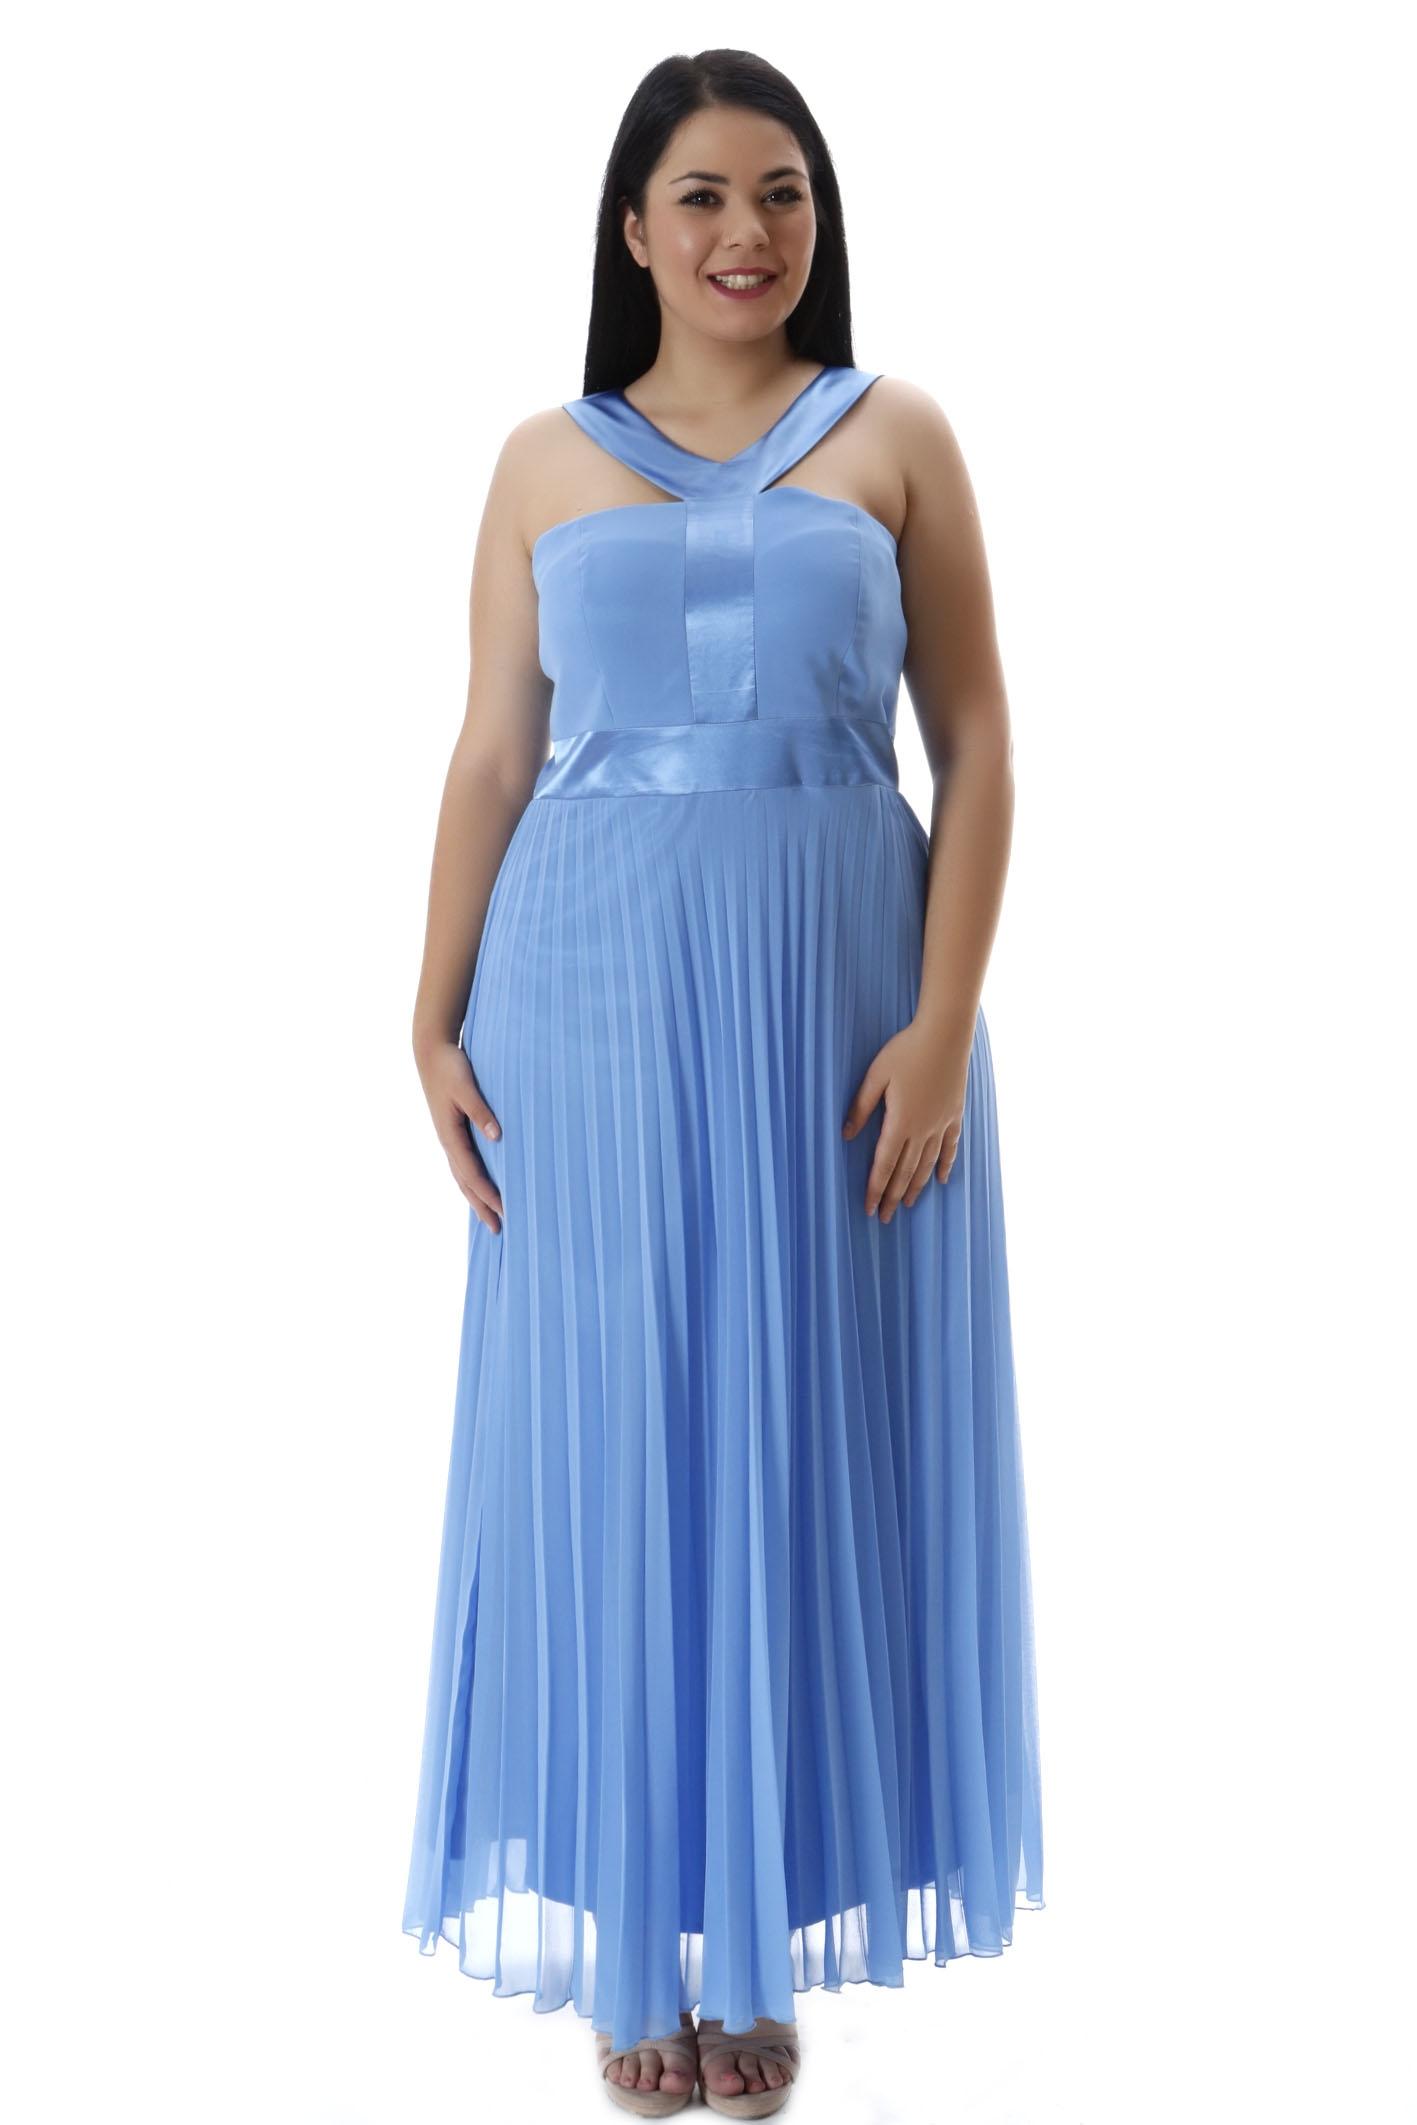 dc8d50ca9671 Γυναικεία Ρούχα, Γυναικεία Φορέματα